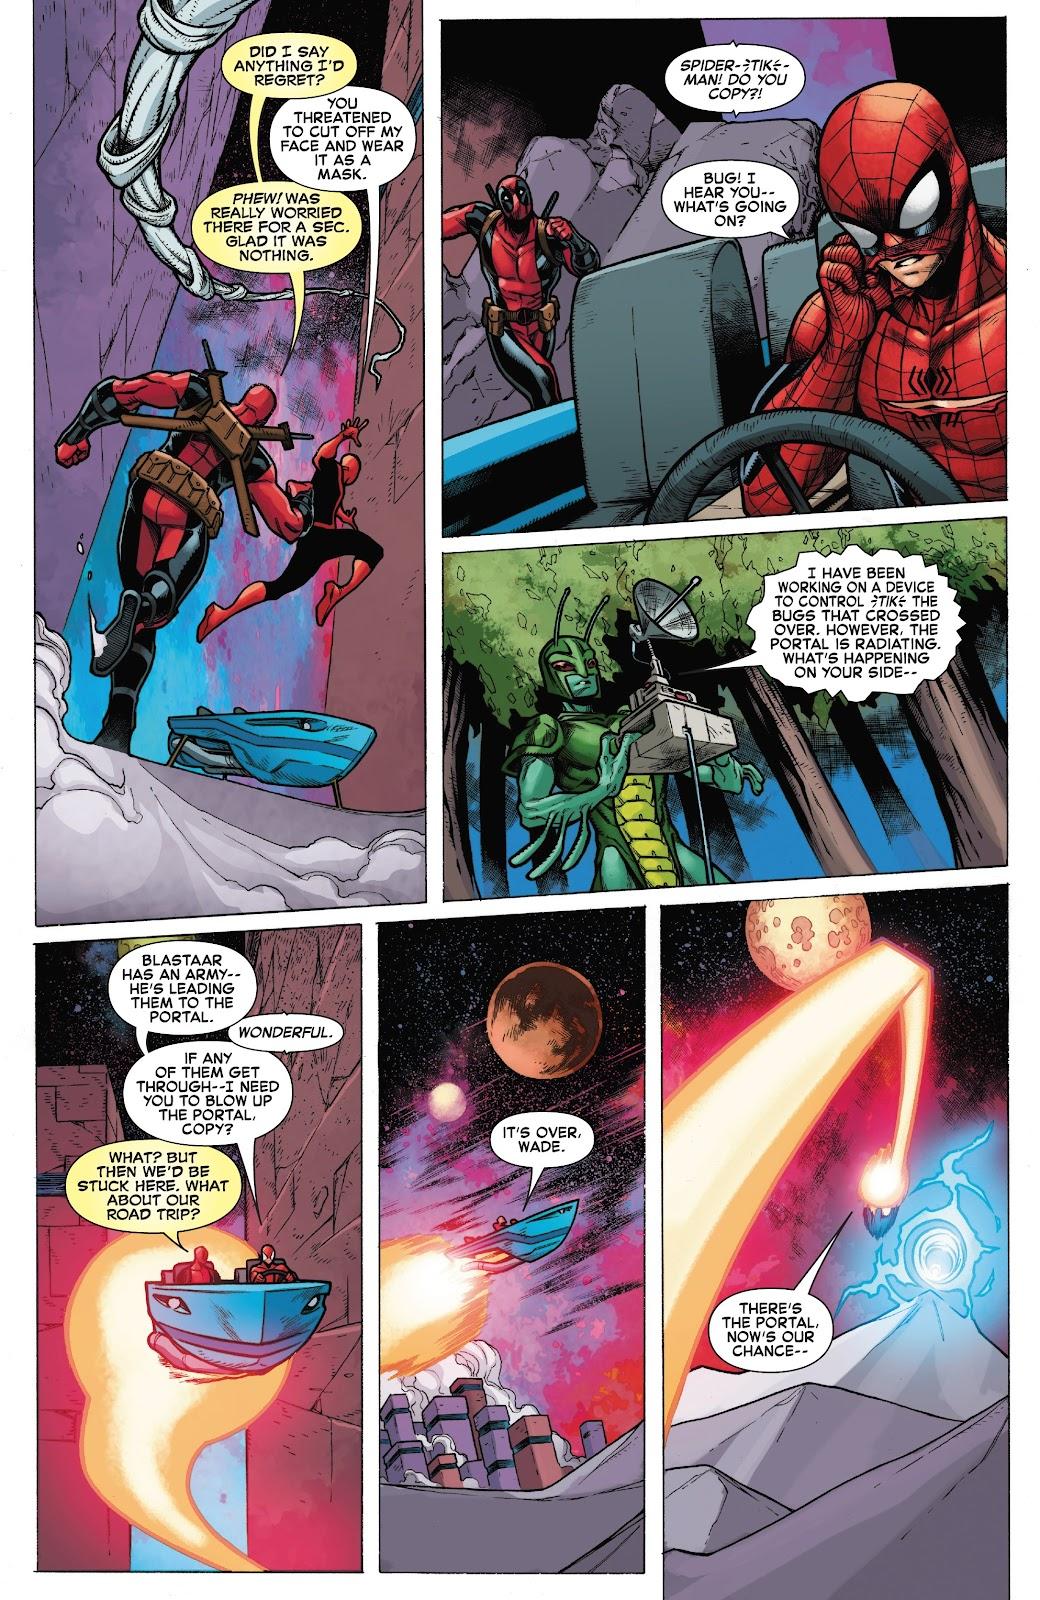 Read online Spider-Man/Deadpool comic -  Issue #45 - 13